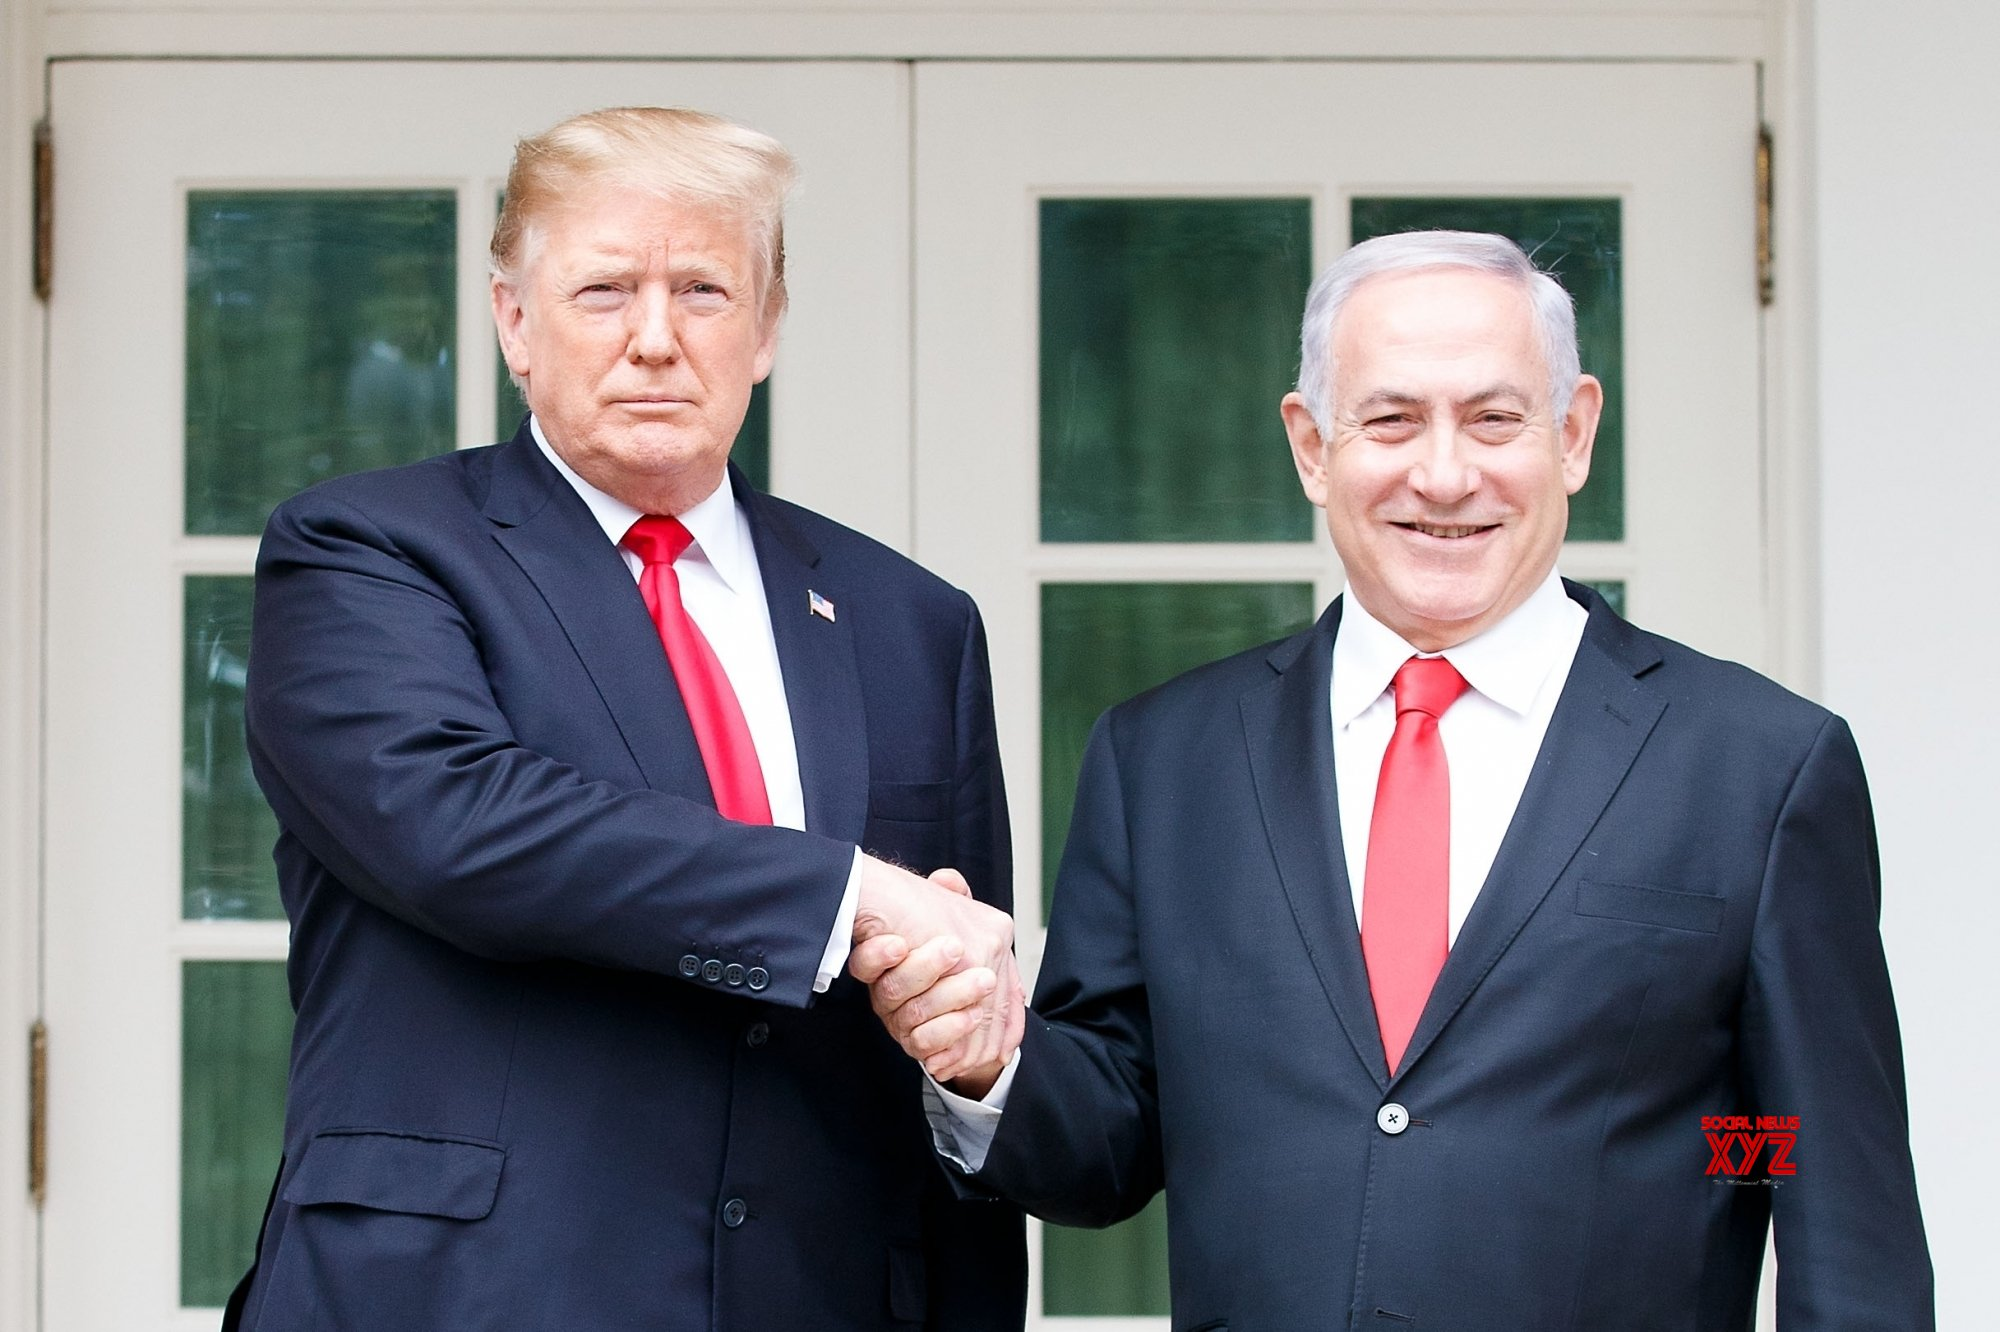 Trump to host Israel's Netanyahu at White House next week